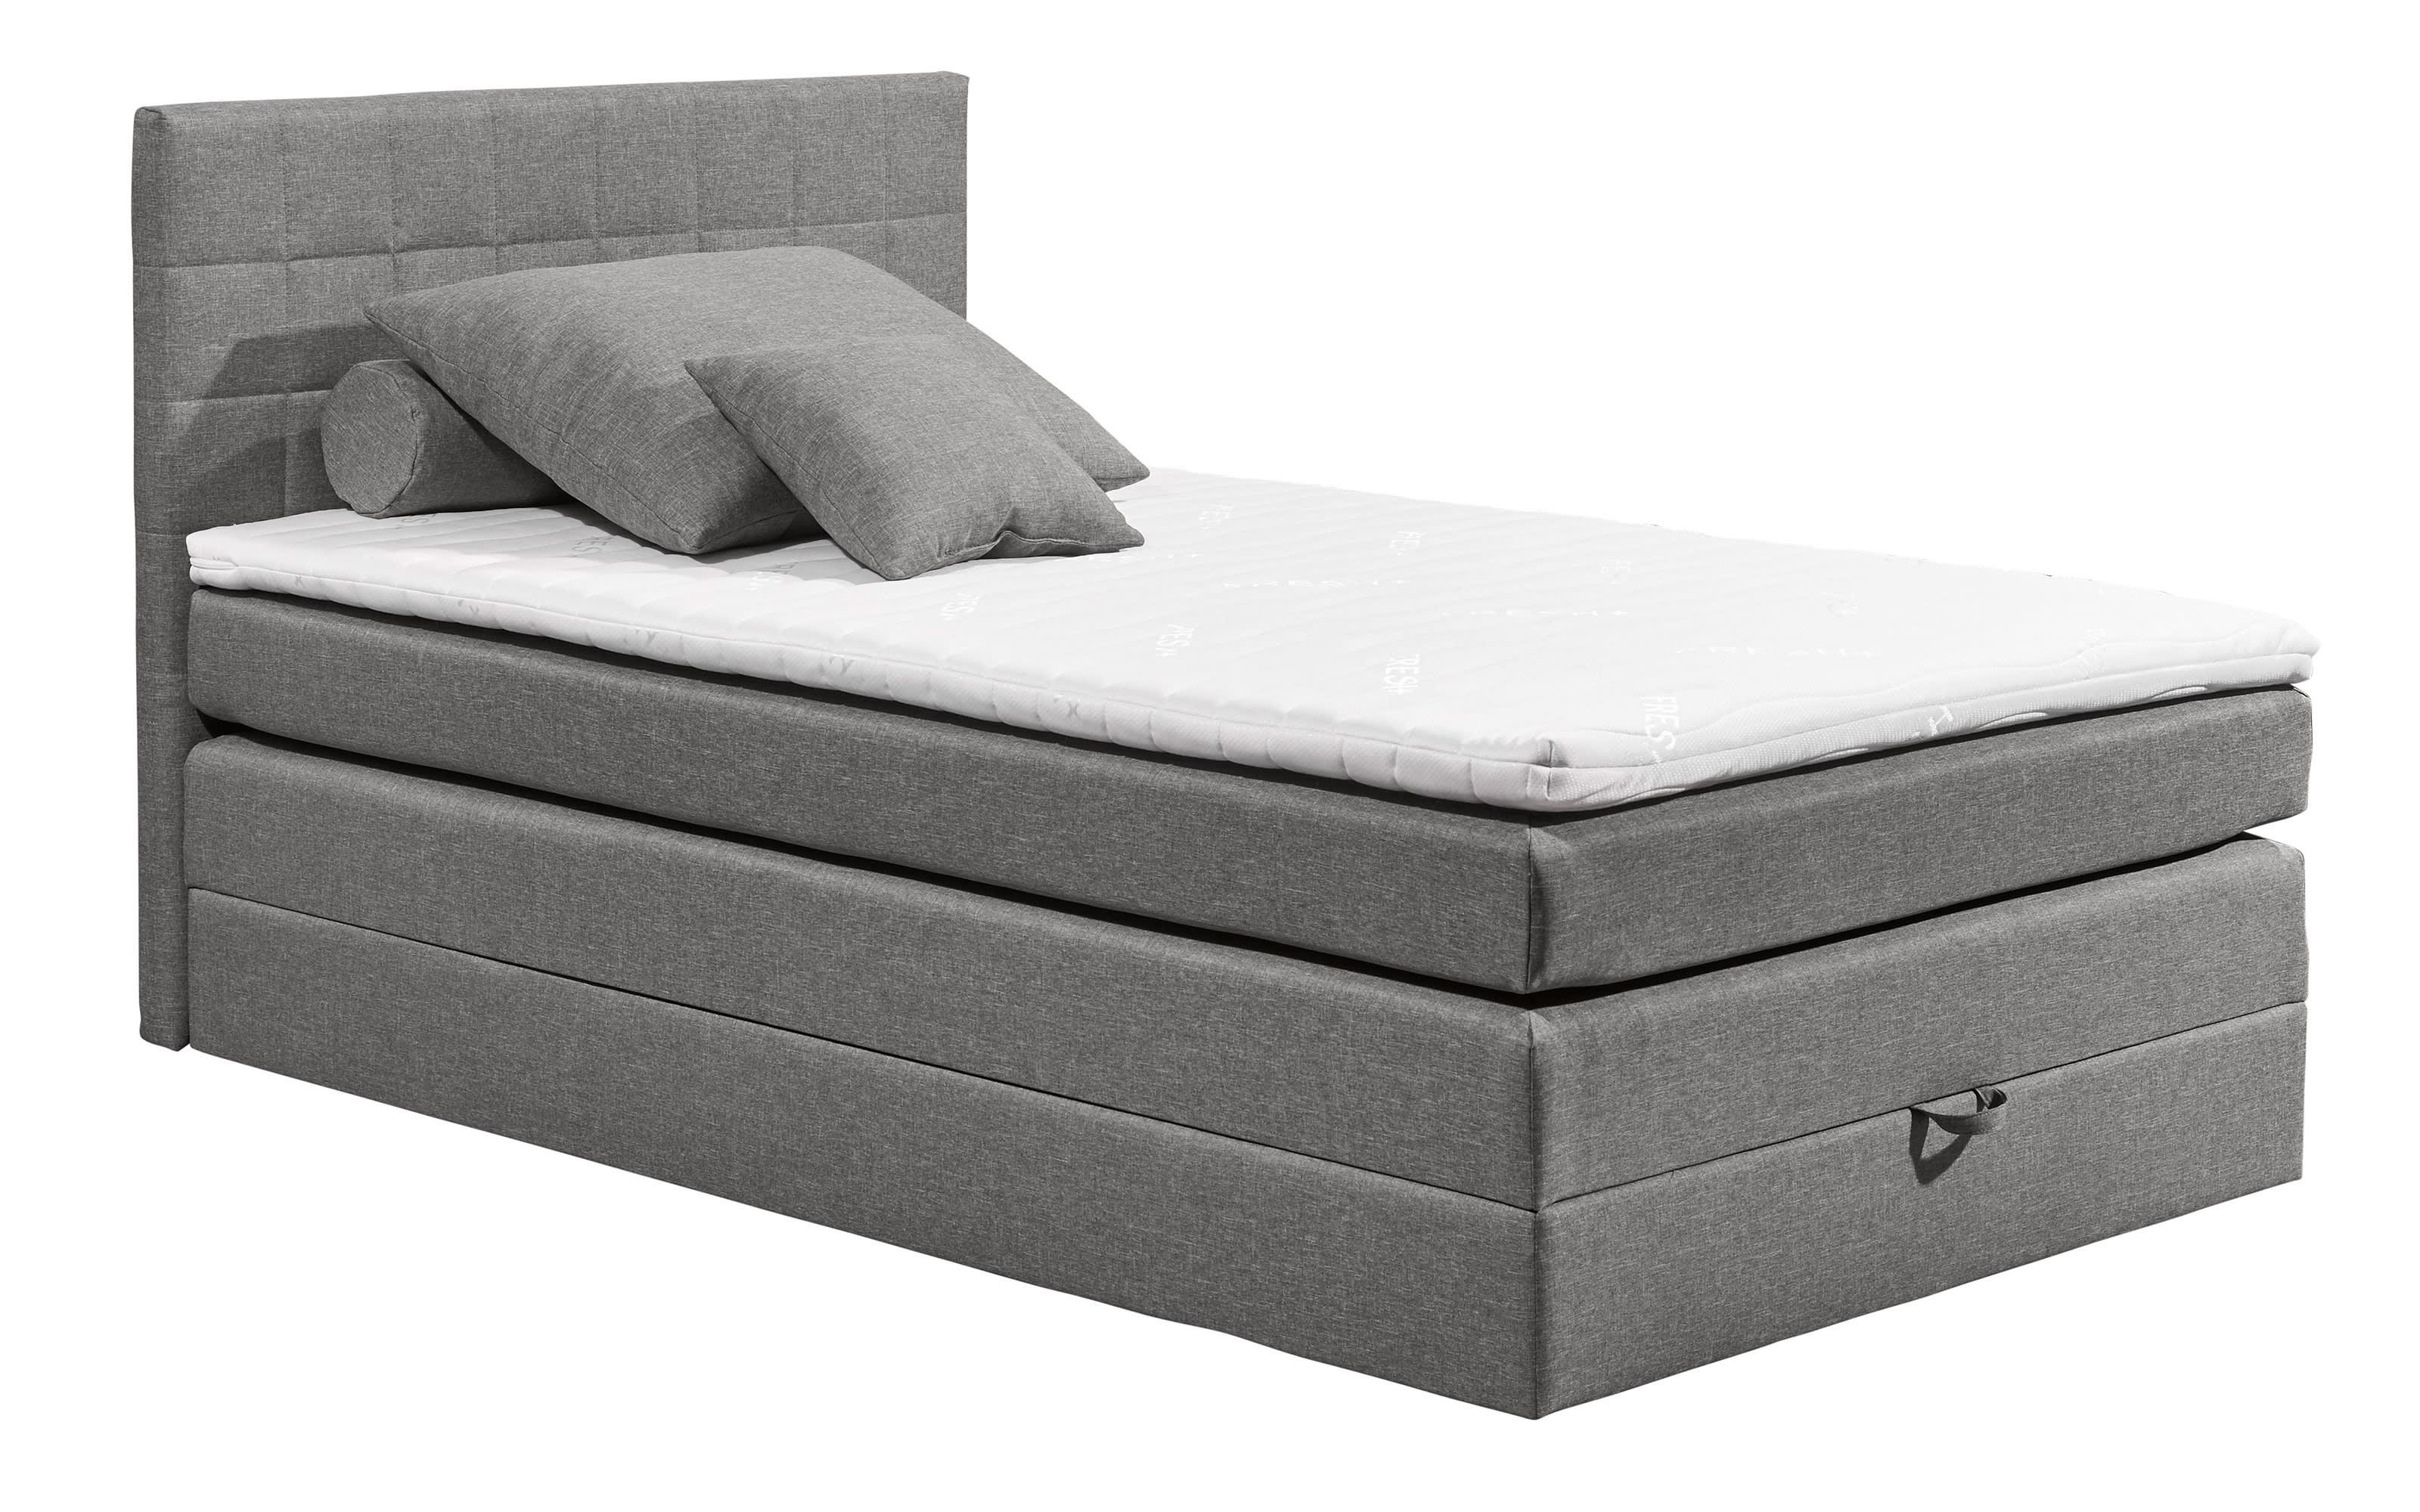 Boxspringbett Hawaii 2 in light grey, mit Bettkasten, inklusive Komfortschaum-Topper